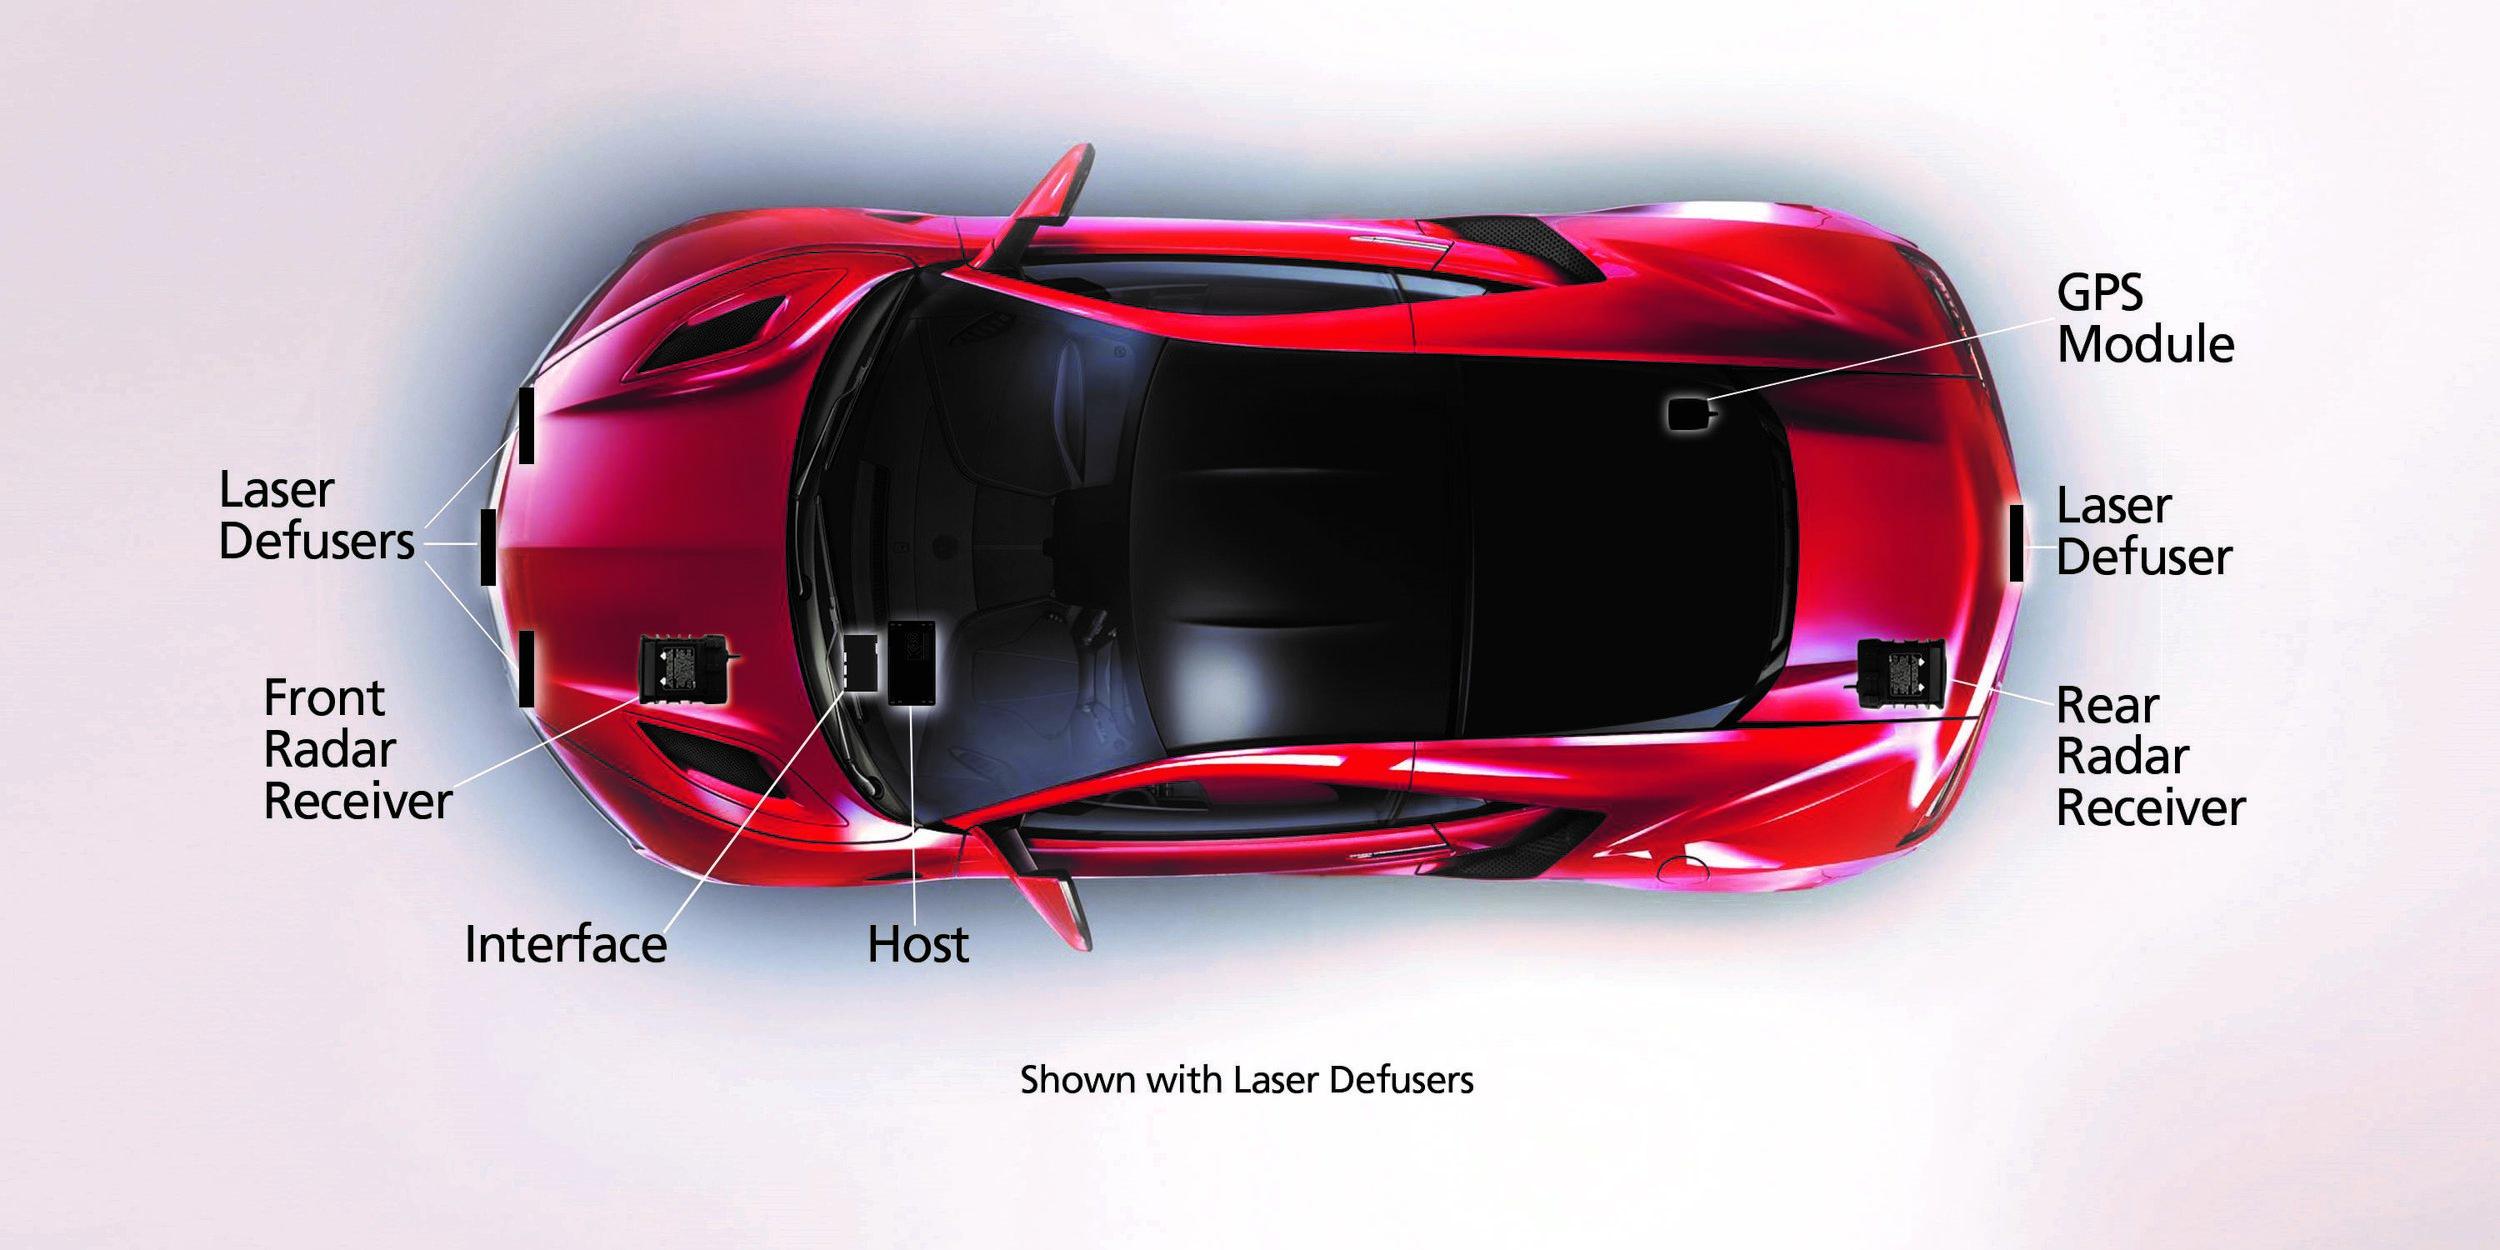 K40-radar-system-red-car-overhead.jpg